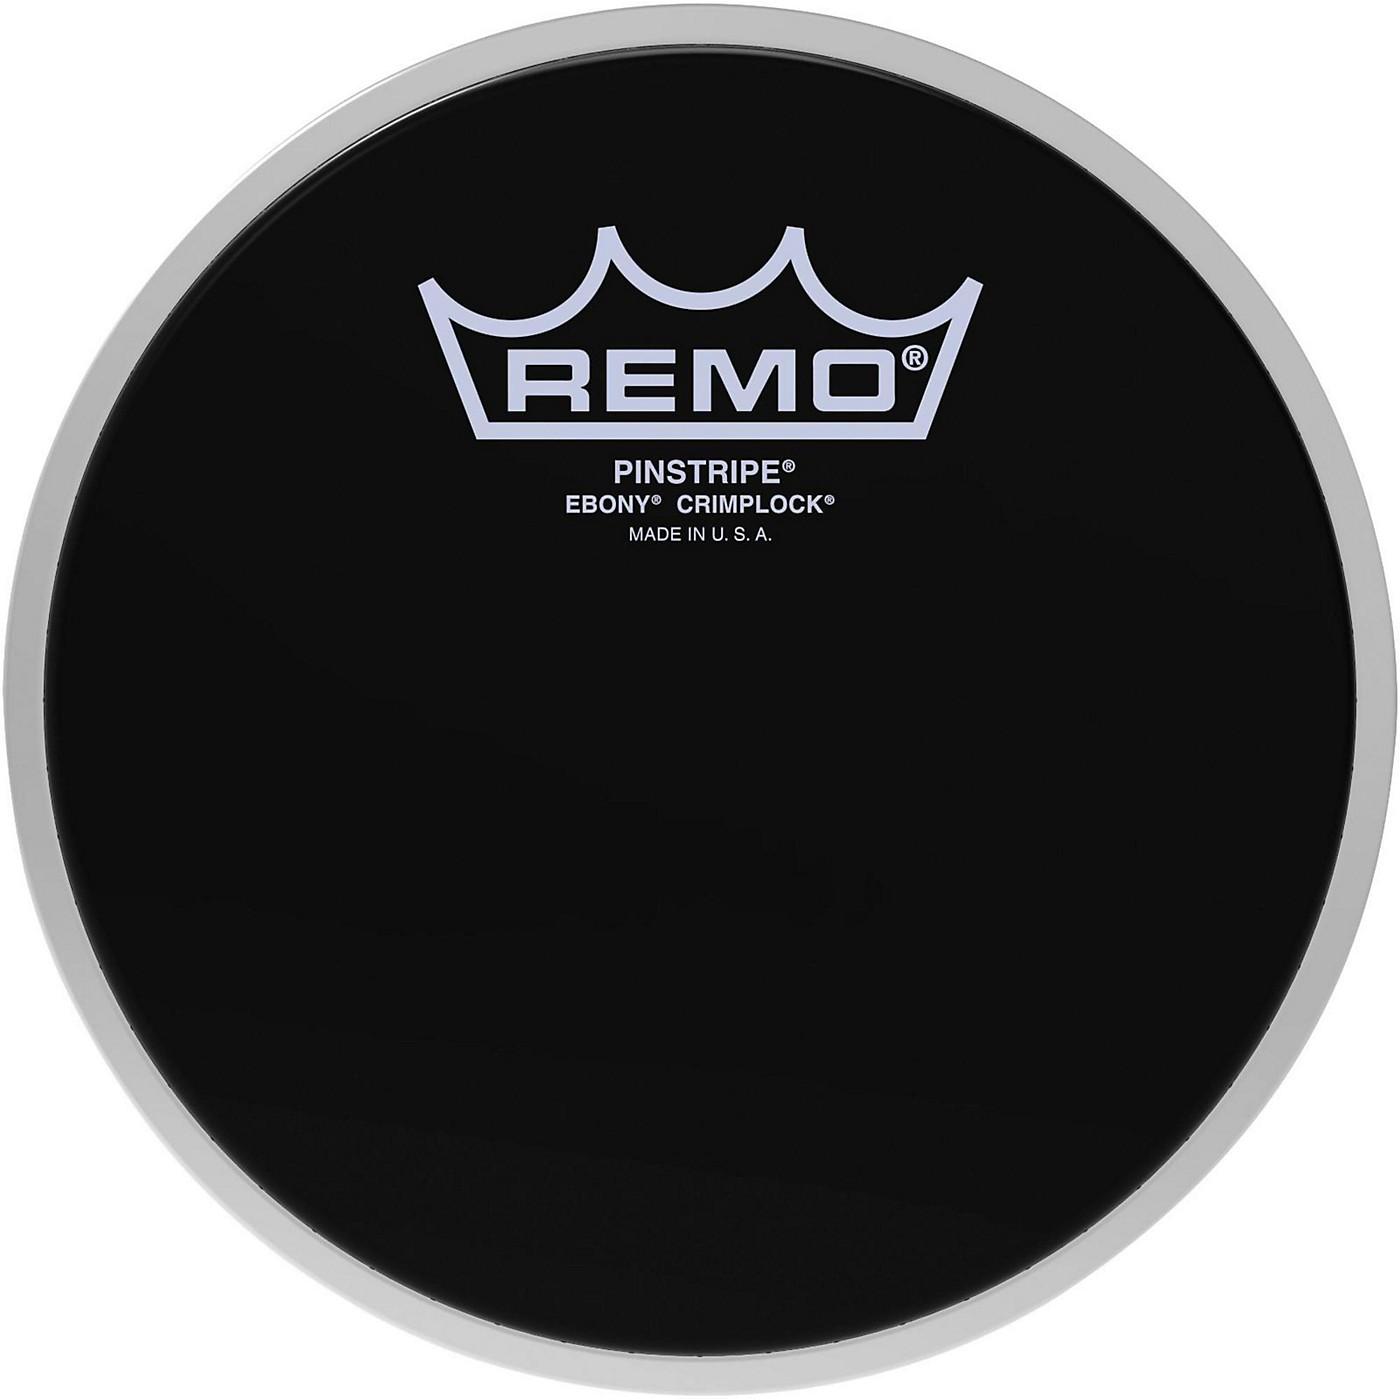 Remo Pinstripe Ebony Crimplock Drum Head thumbnail